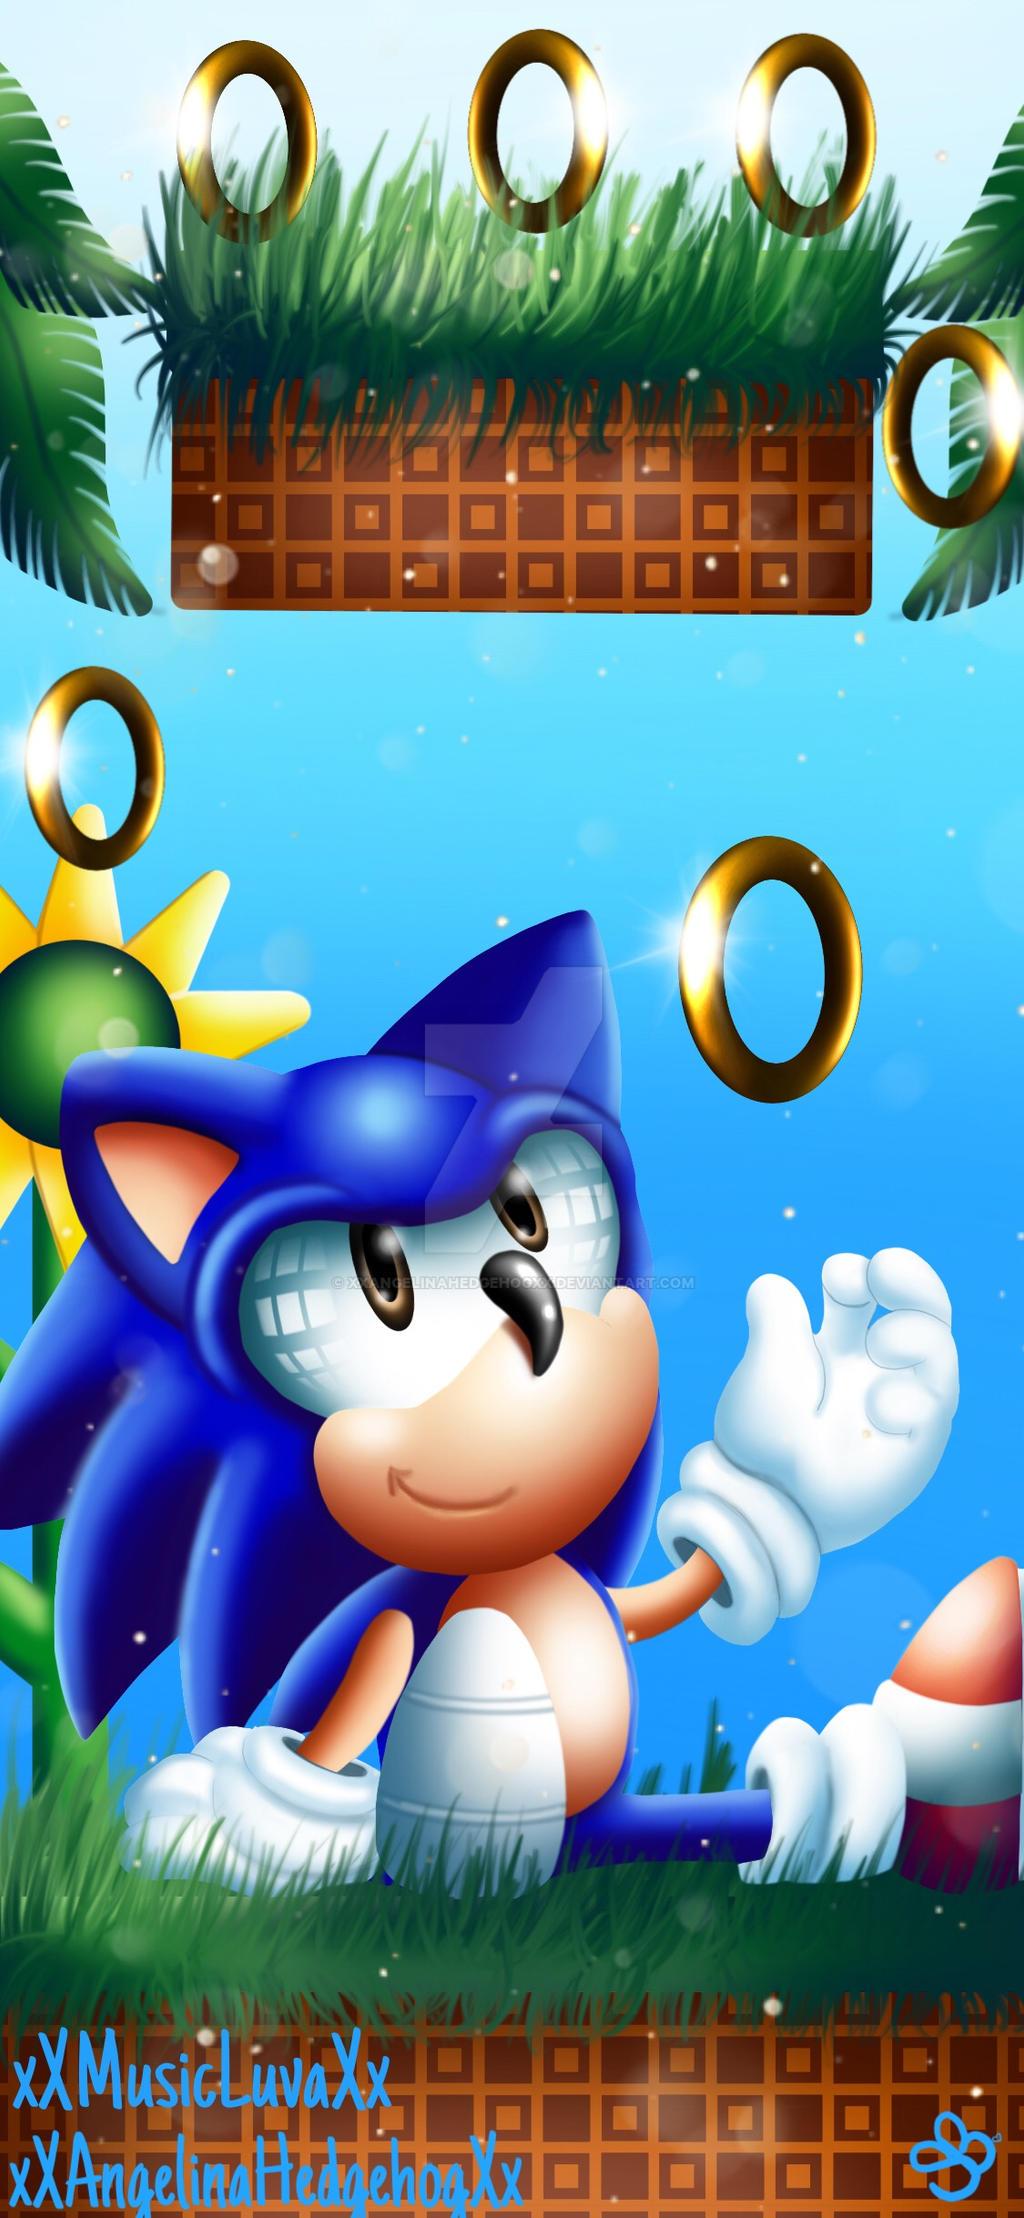 Classic Sonic Phone Wallpaper By Xxangelinahedgehogxx On Deviantart